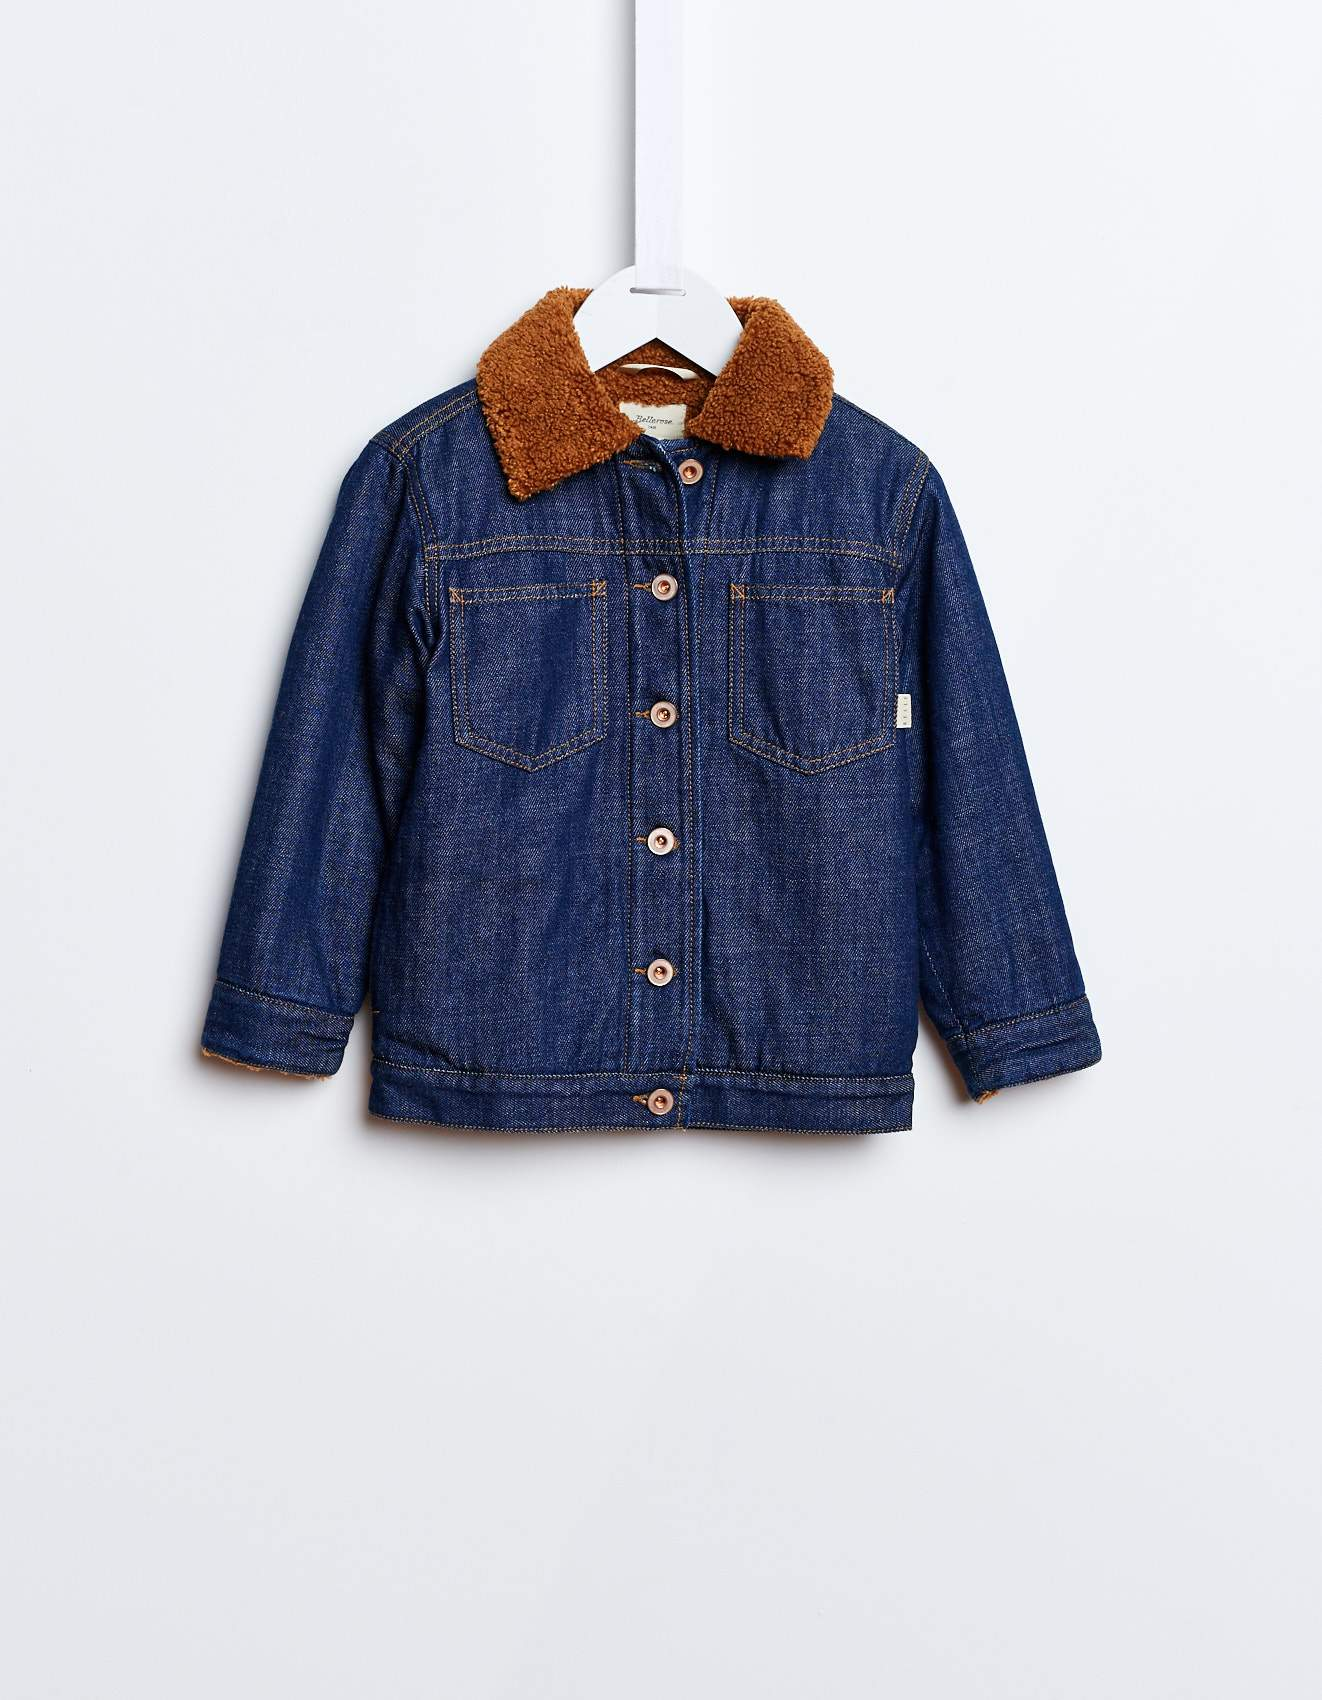 londen-jacket-bellerose2.jpg